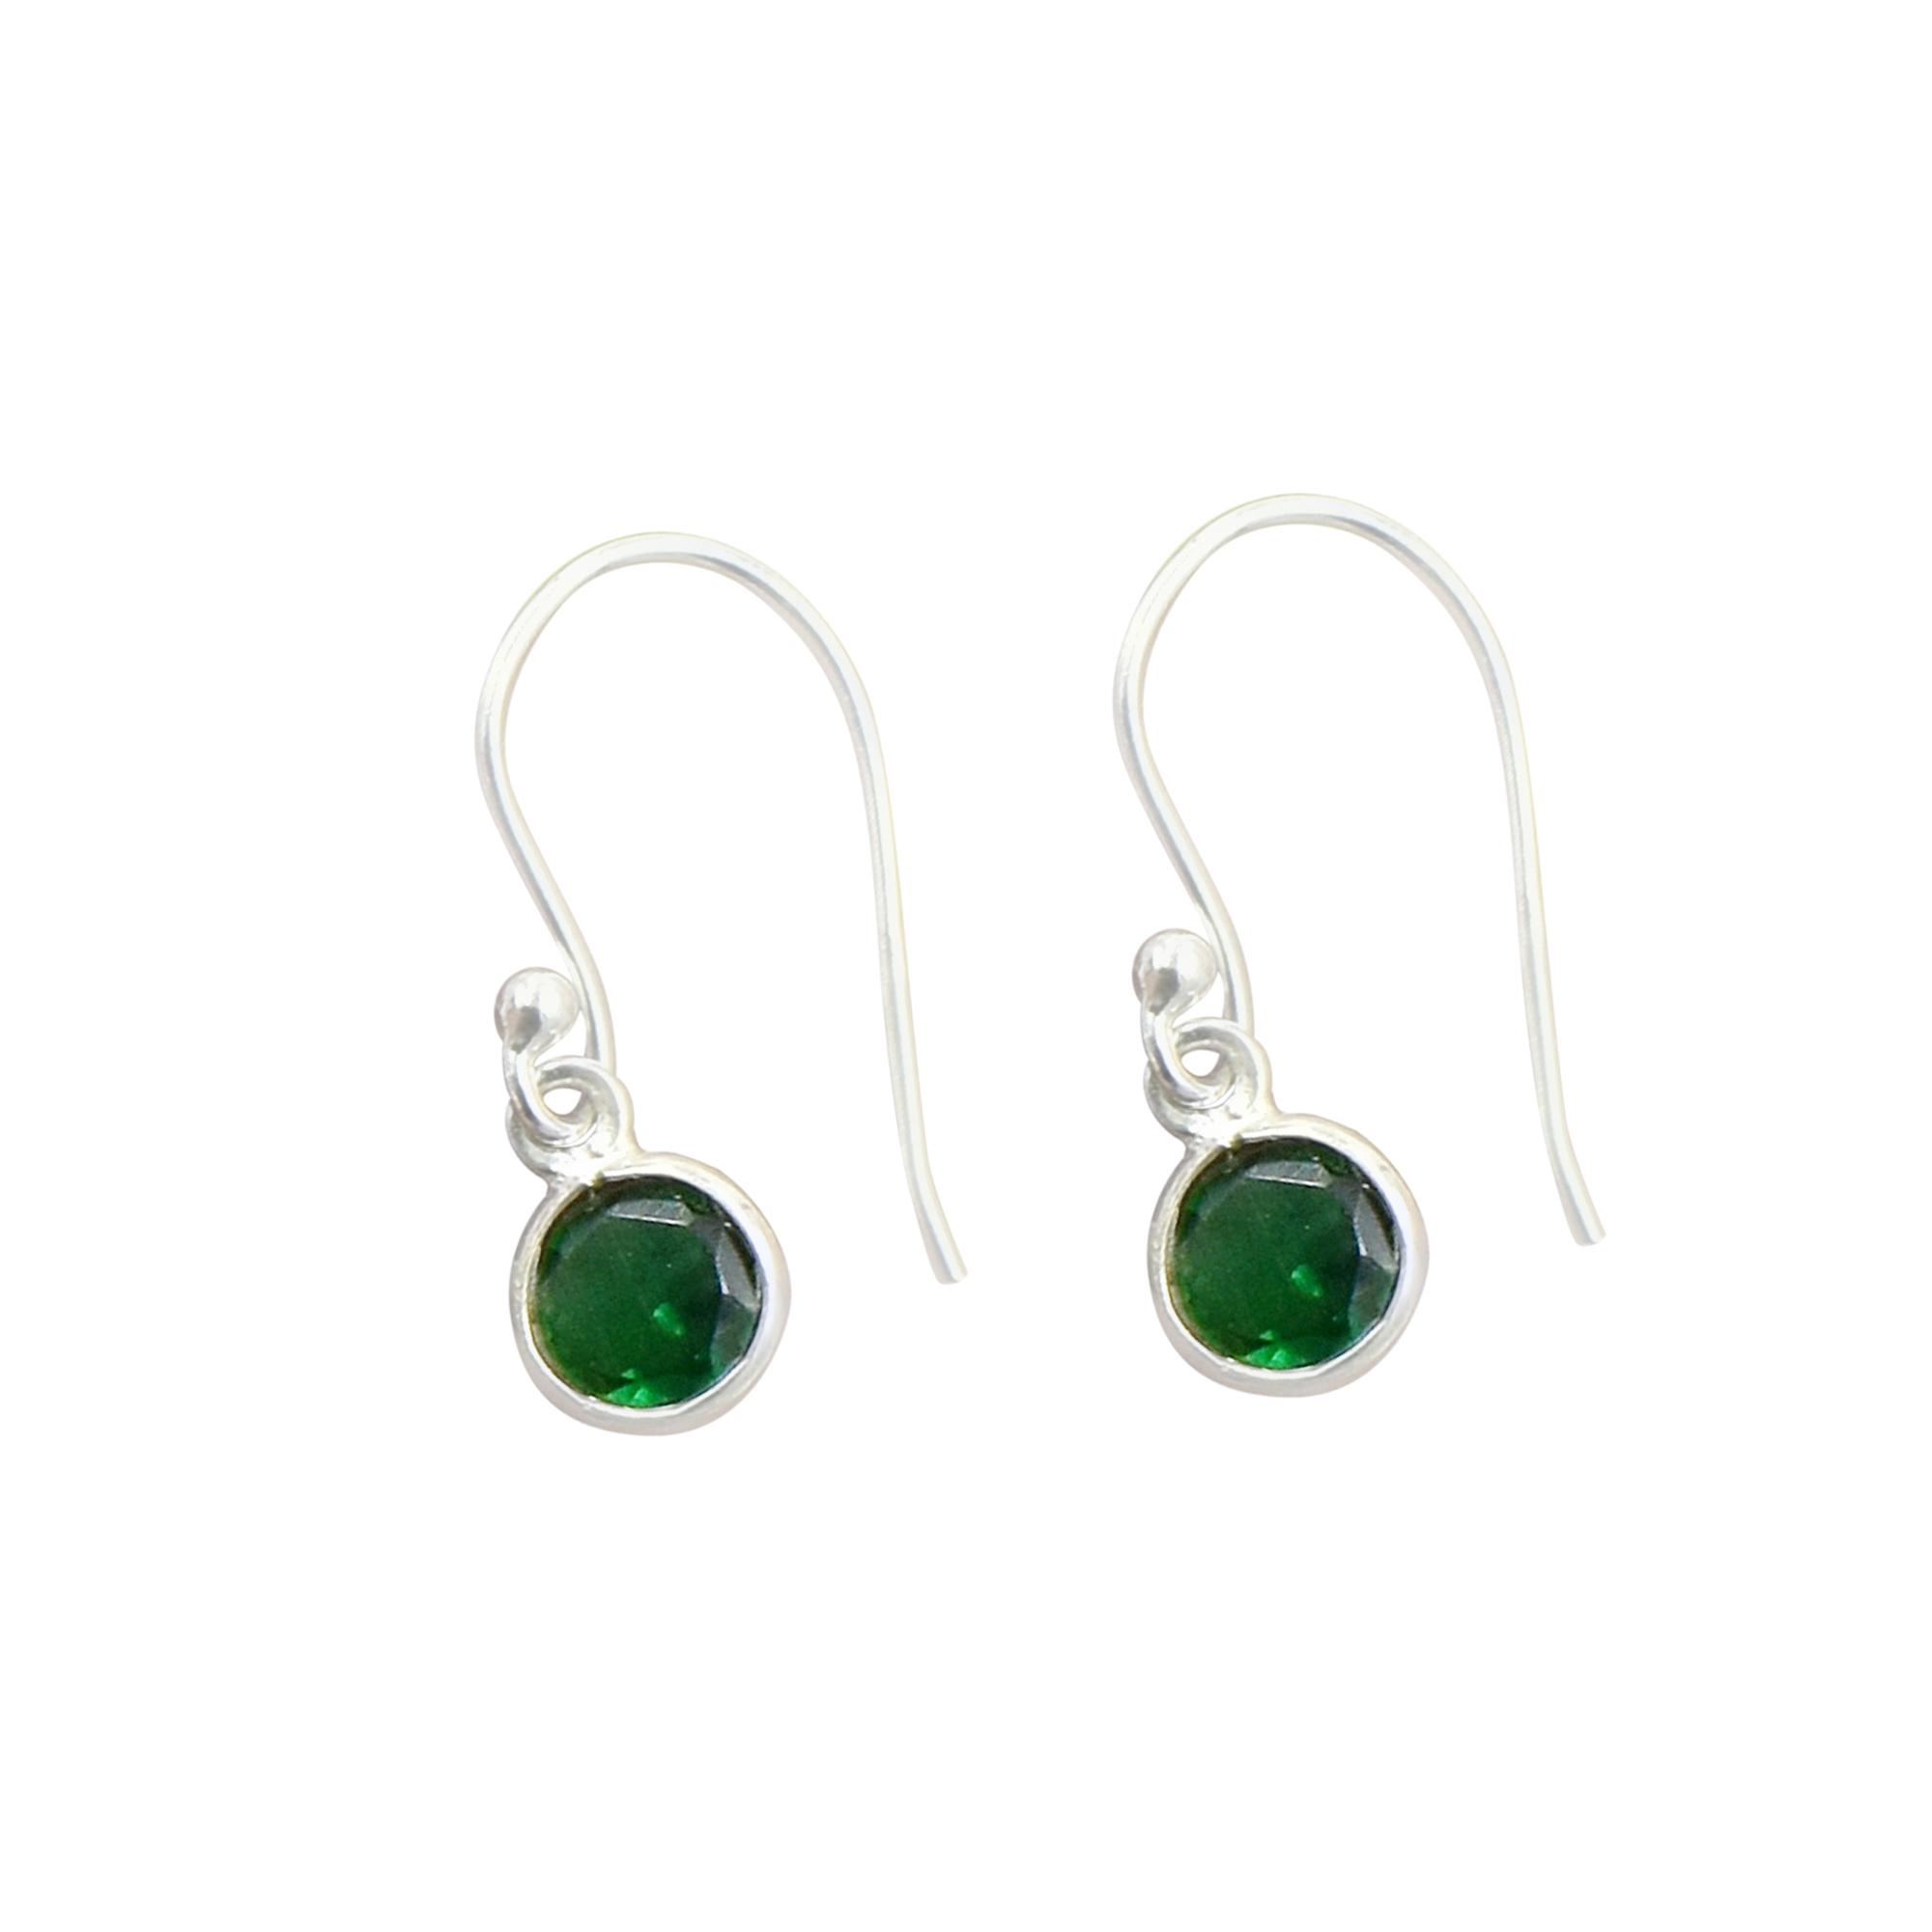 Amazing Green Quartz Gemstone Tiny Earring 925 Sterling Silver Dangle Drop Fashion Earring Minimalist Jewelry